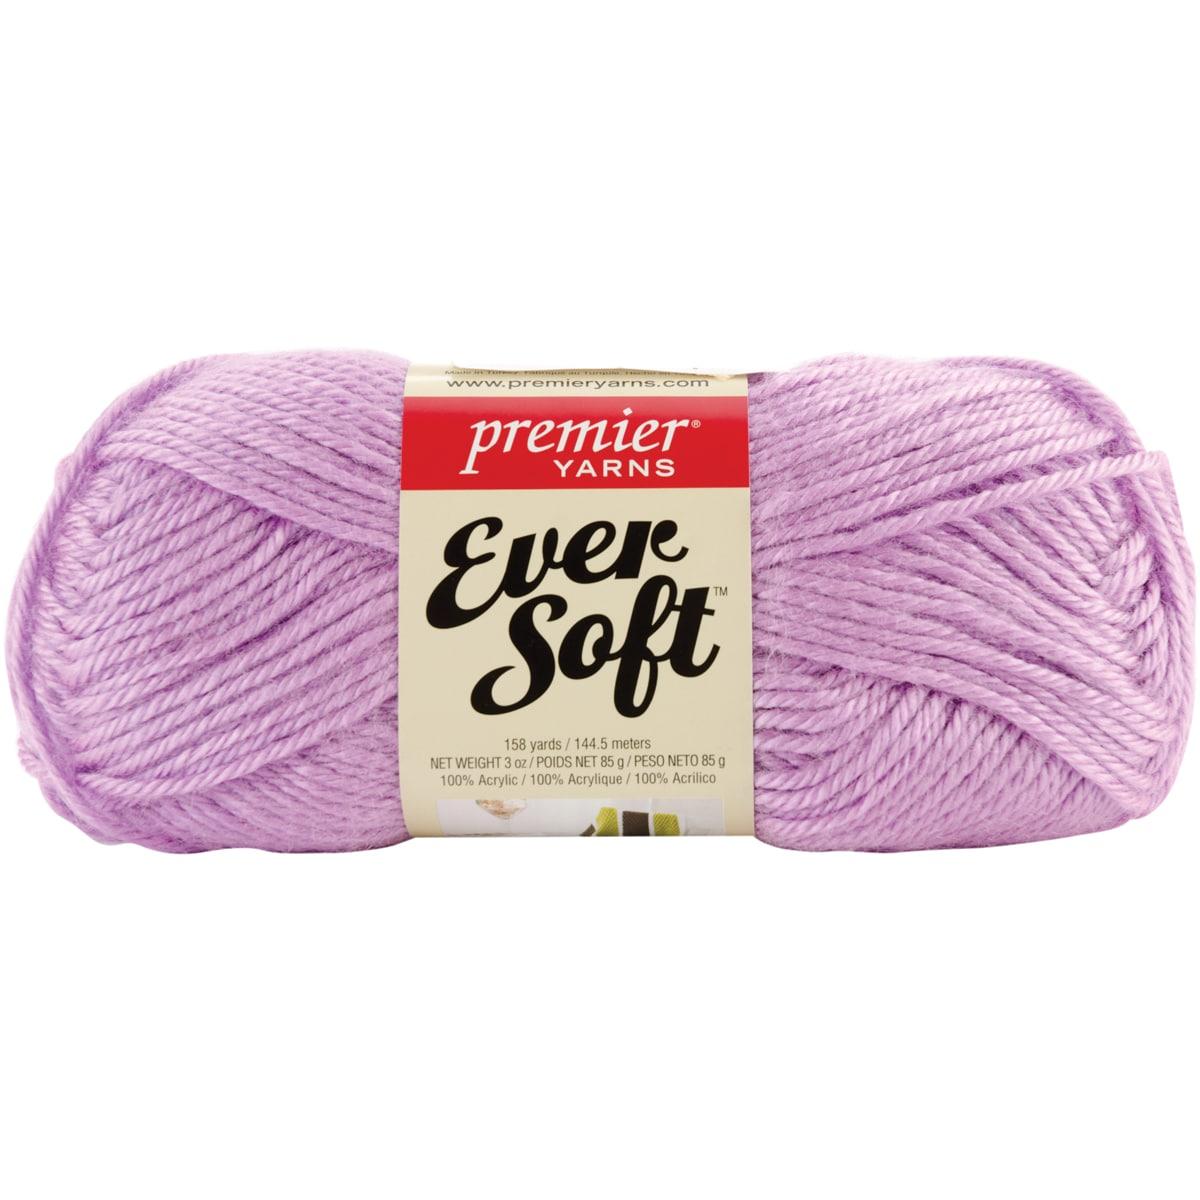 Premier Ever Soft Yarn Lot Of 3 Skeins 3 oz. Lilac #70-13